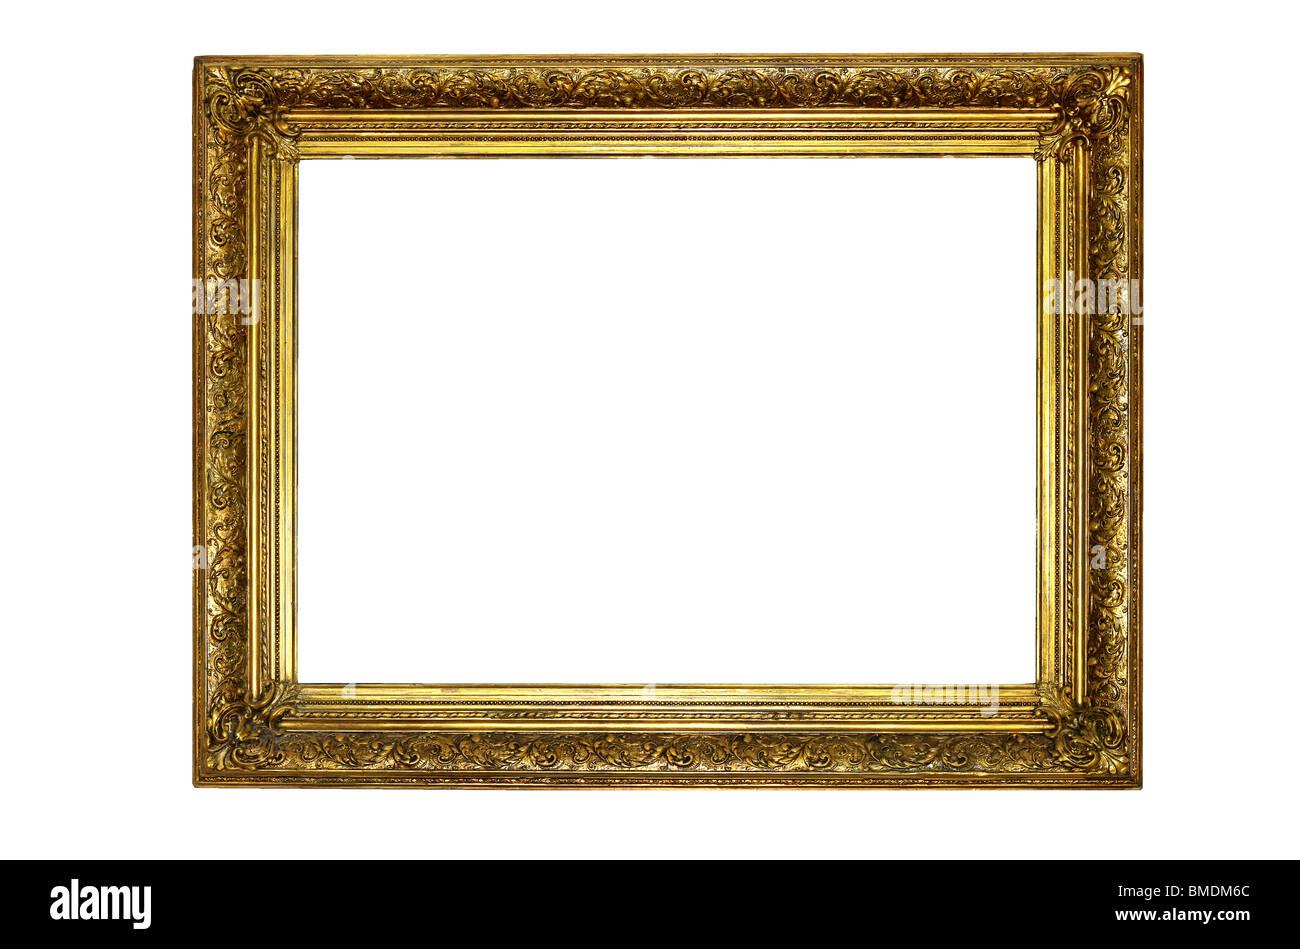 Gold Bilderrahmen im Renaissance-Stil Stockfoto, Bild: 29804724 - Alamy